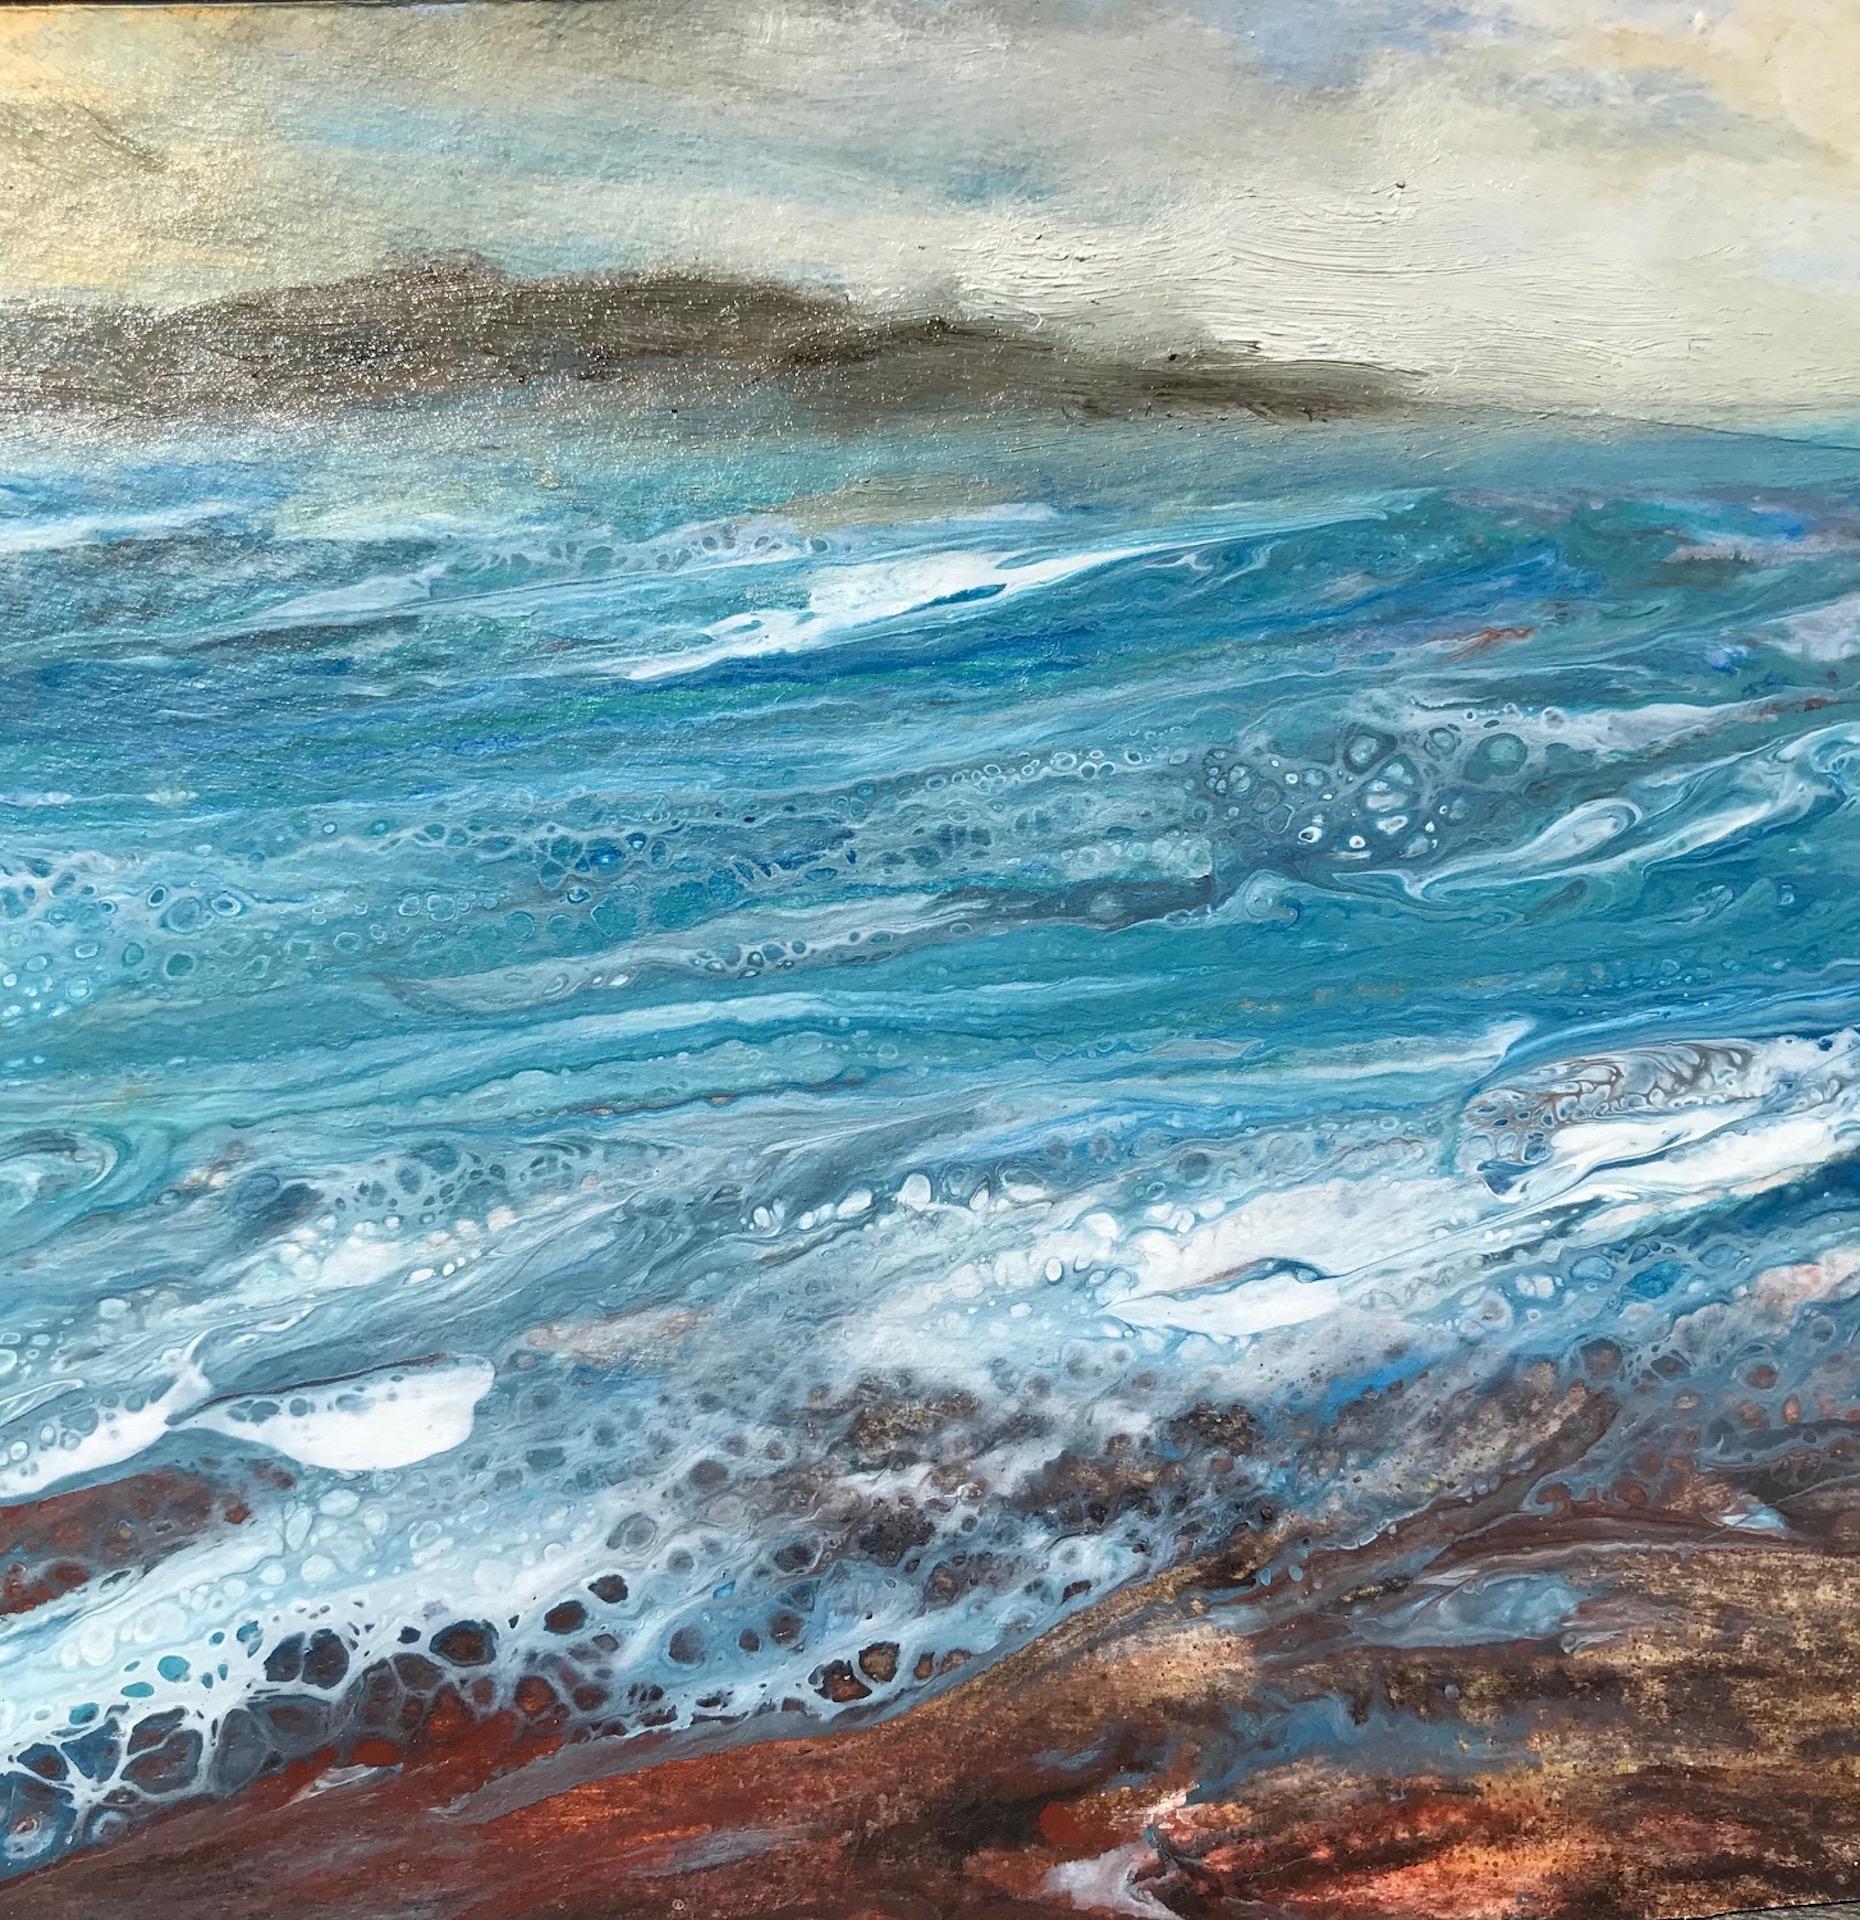 Cathryn Jeff, Sea Foam, Original Affordable Contemporary Art, Seascape Painting